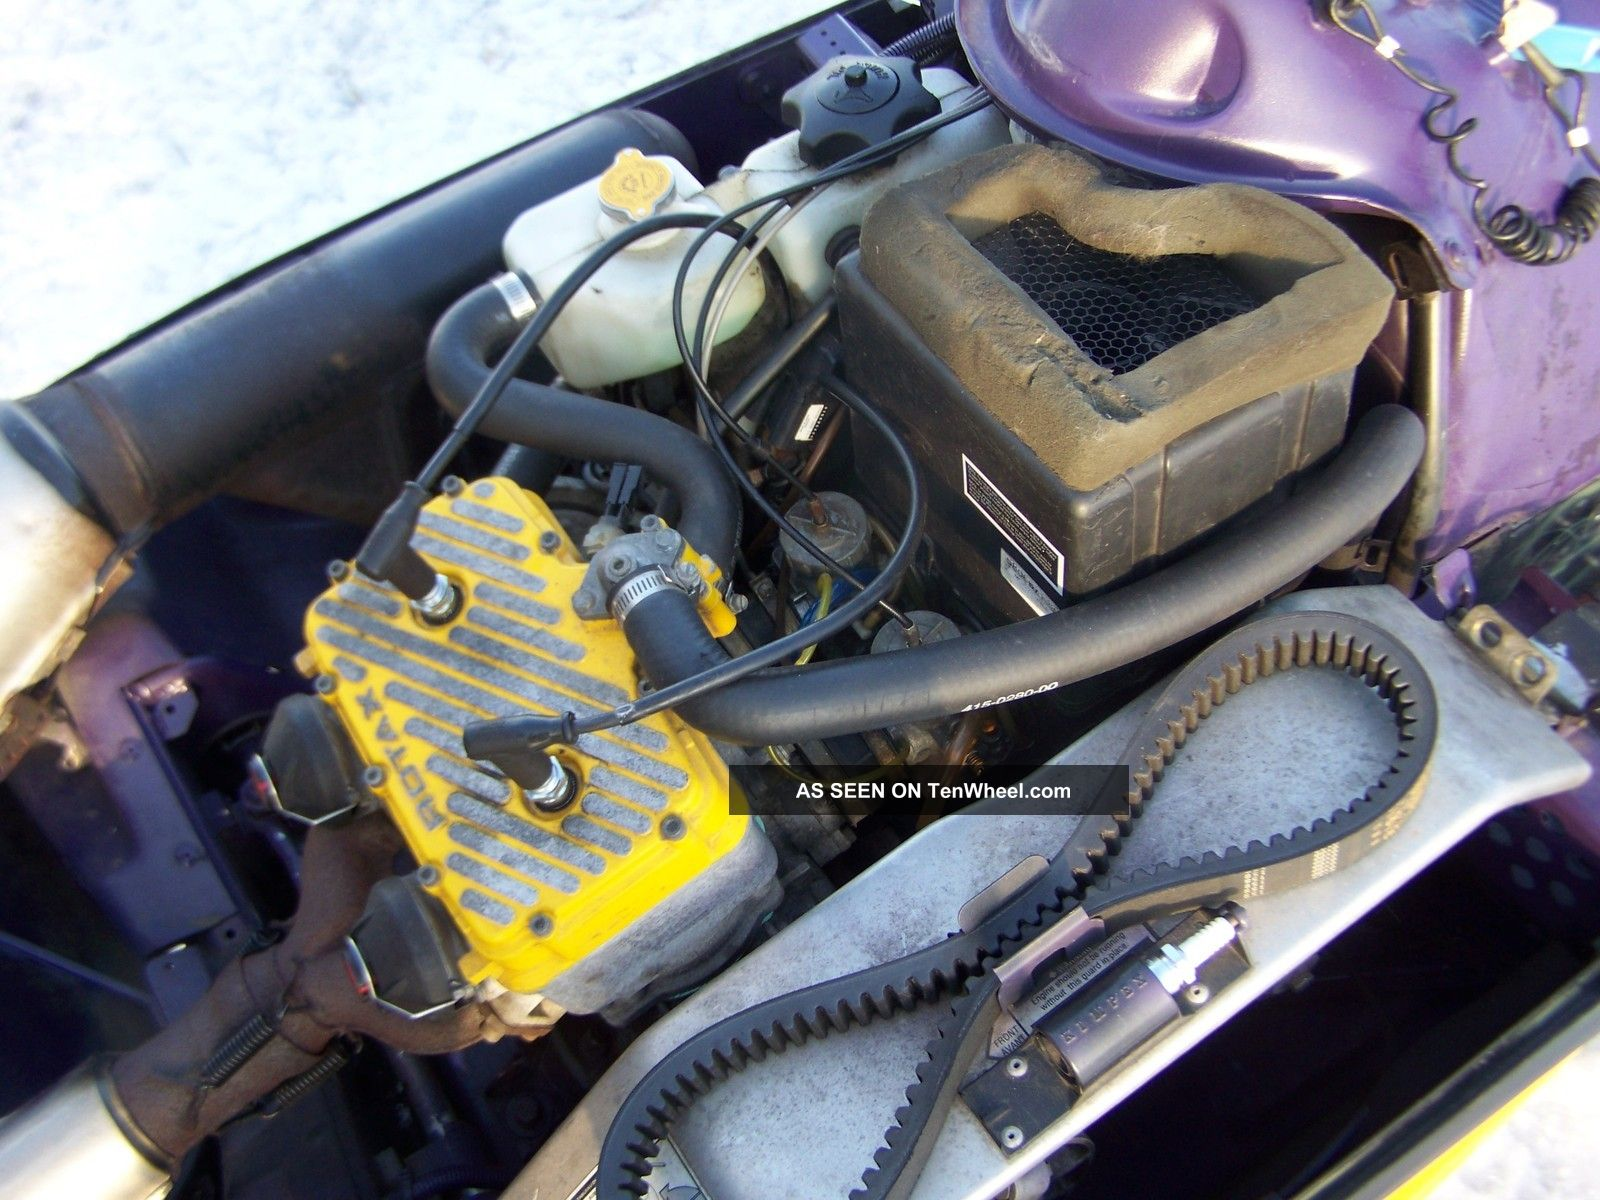 1999 Polaris Snowmobile Wiring Diagrams Ski Doo Formula 500 Engine Cadillac